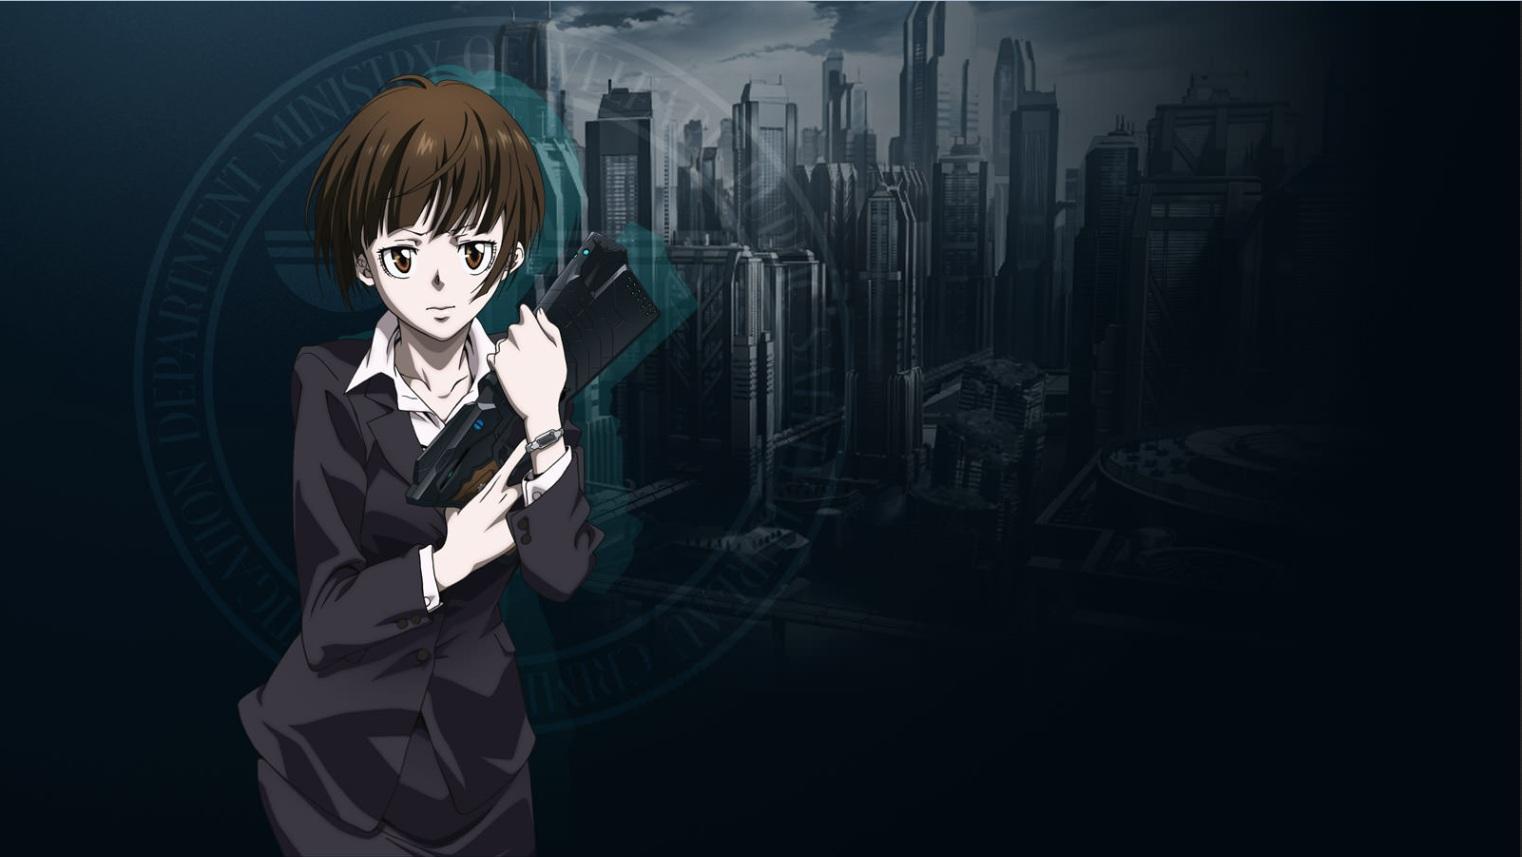 Visuel du personnage Tsunemori Akane de Psycho-Pass